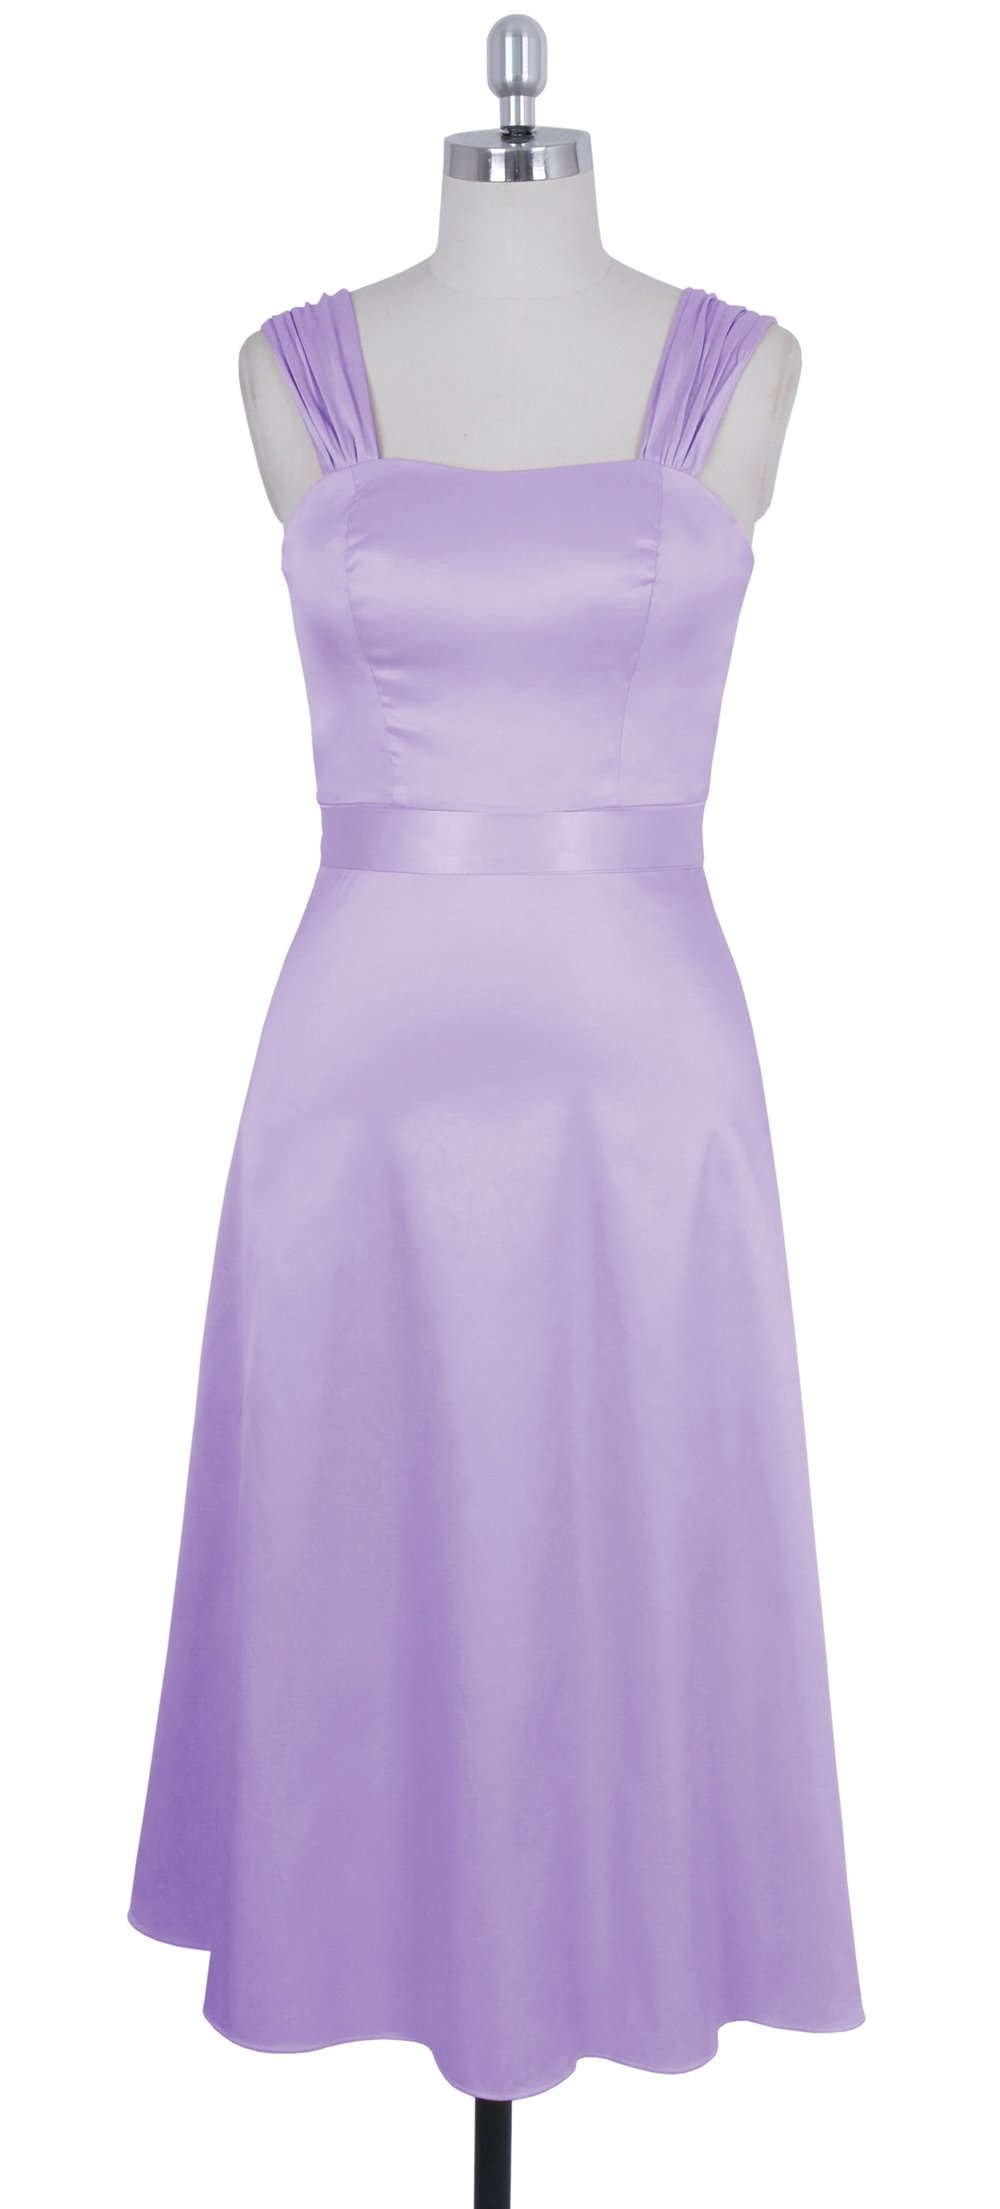 Faship Womens Wide Straps Tea Length Formal Dress